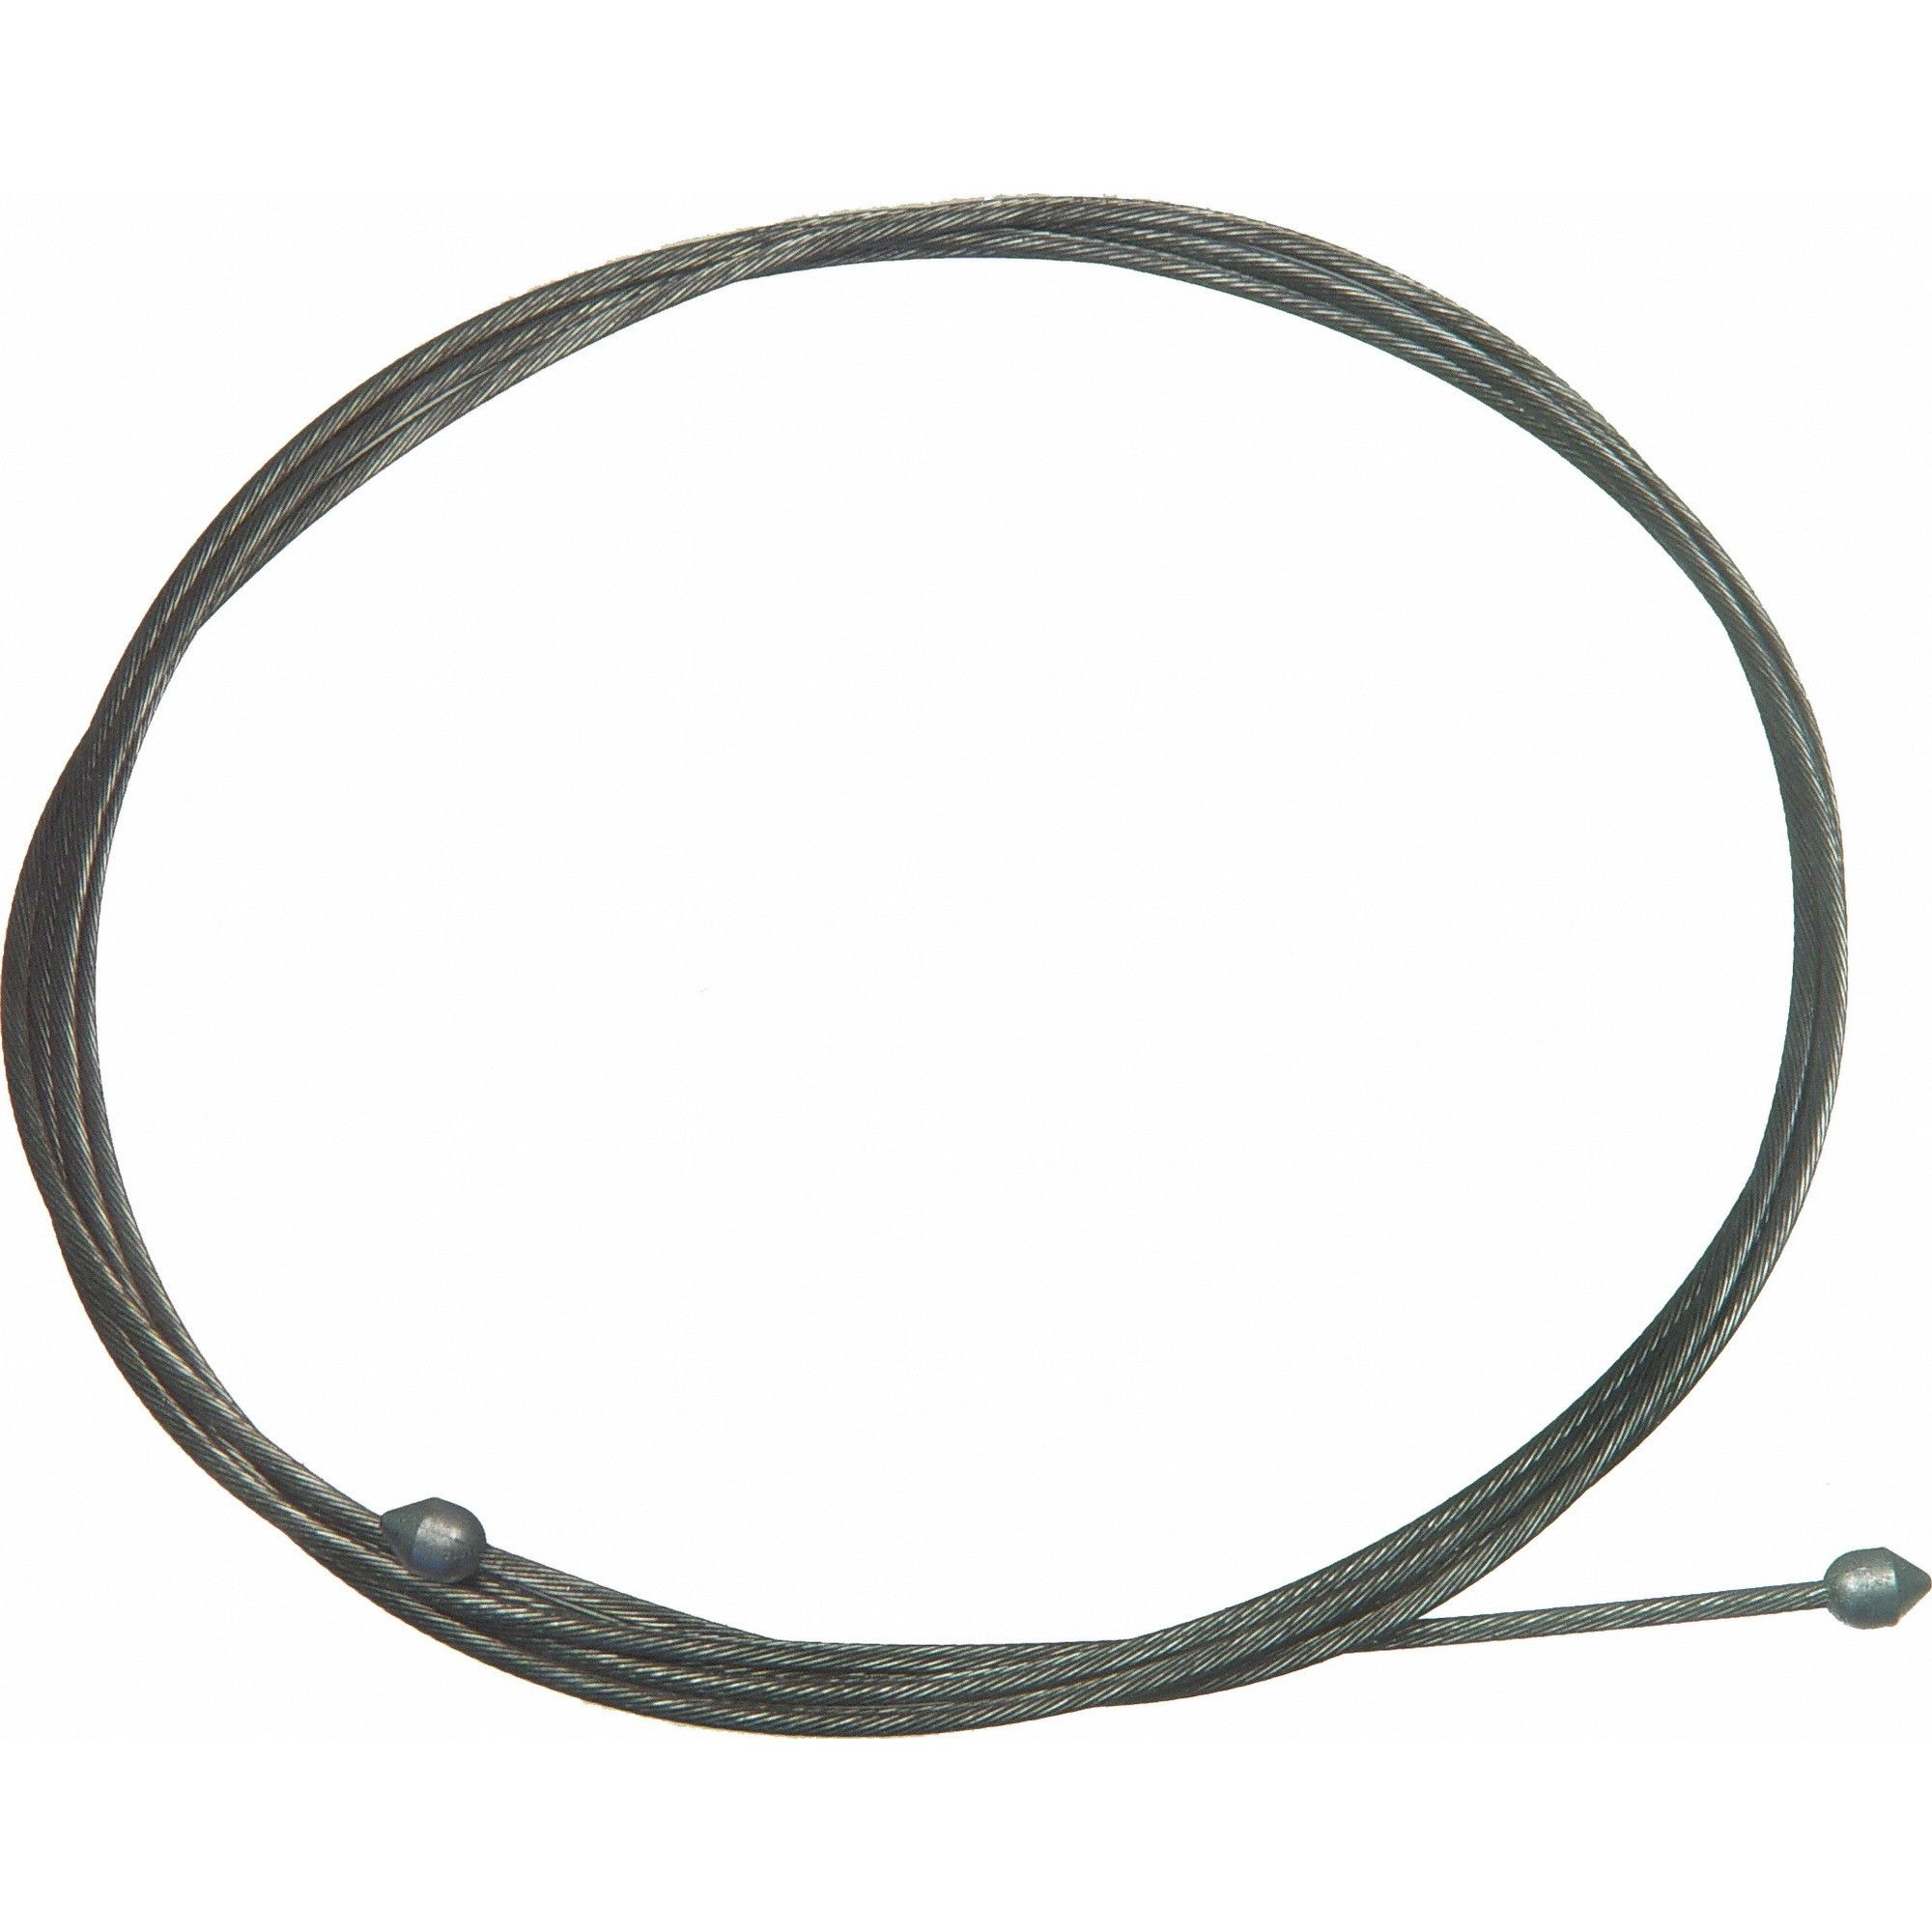 Chevrolet K20 Parking Brake Cable Replacement (Dorman